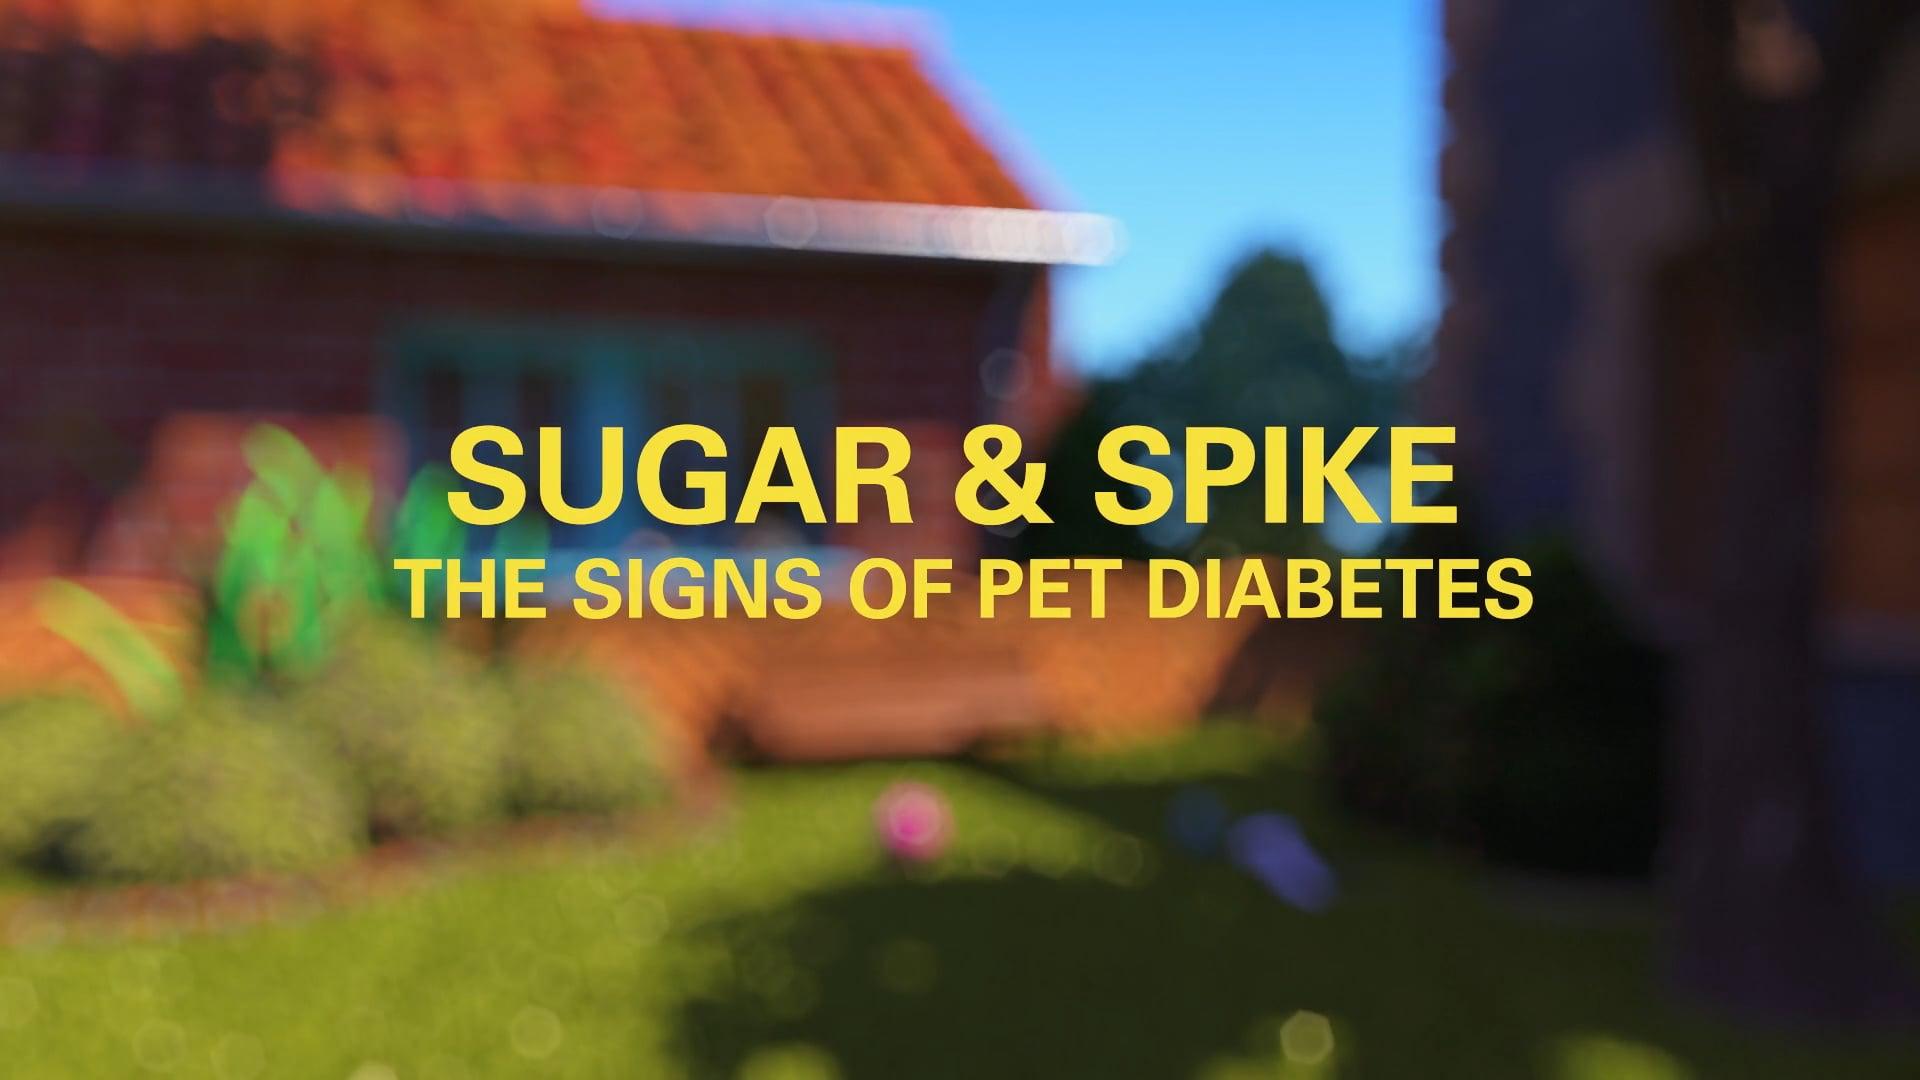 Sugar & Spike - The signs of pet diabetes